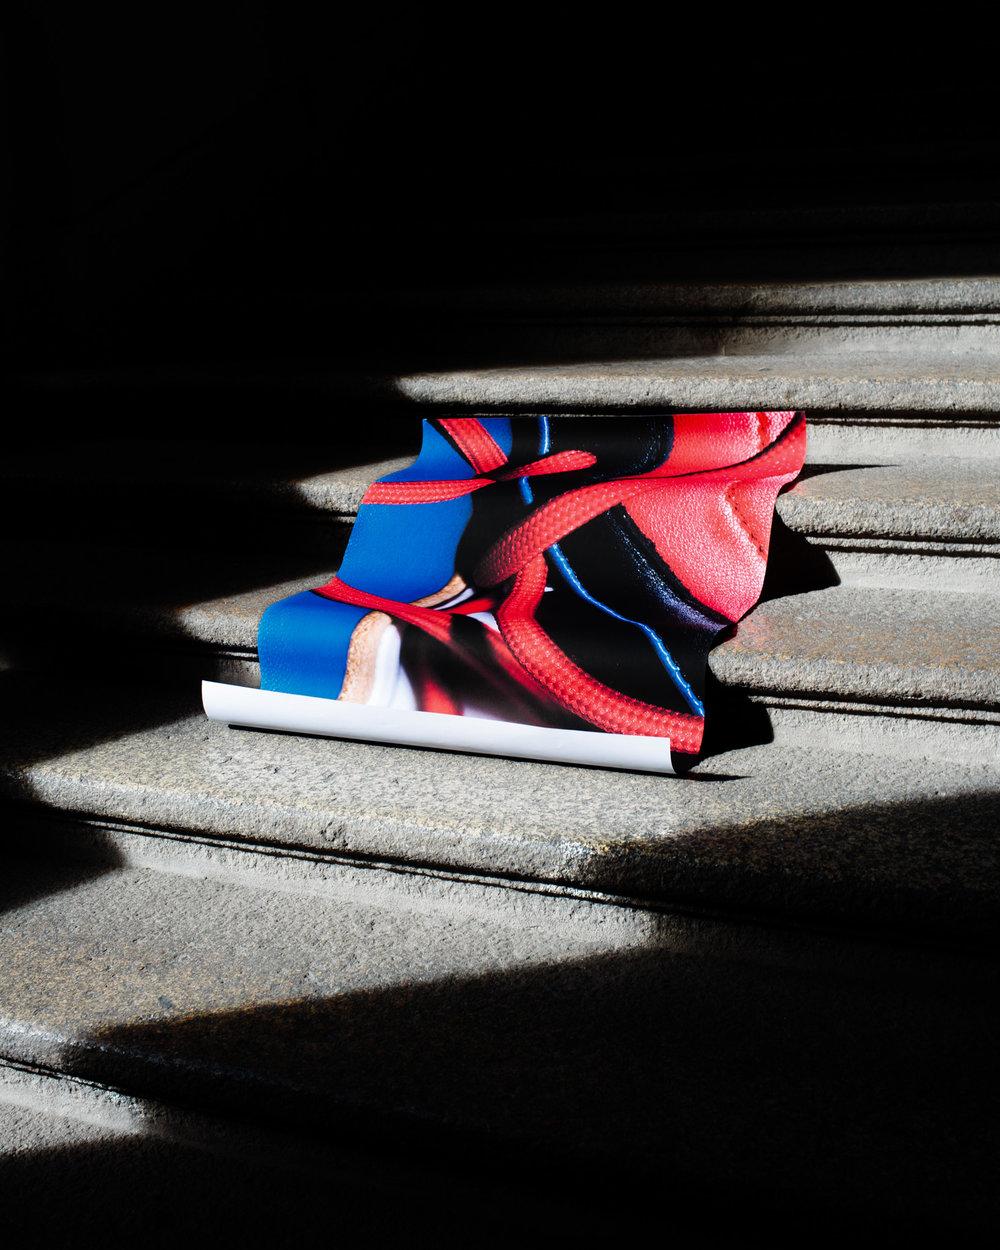 volta-footwear-lightweight-3-def-2.jpg